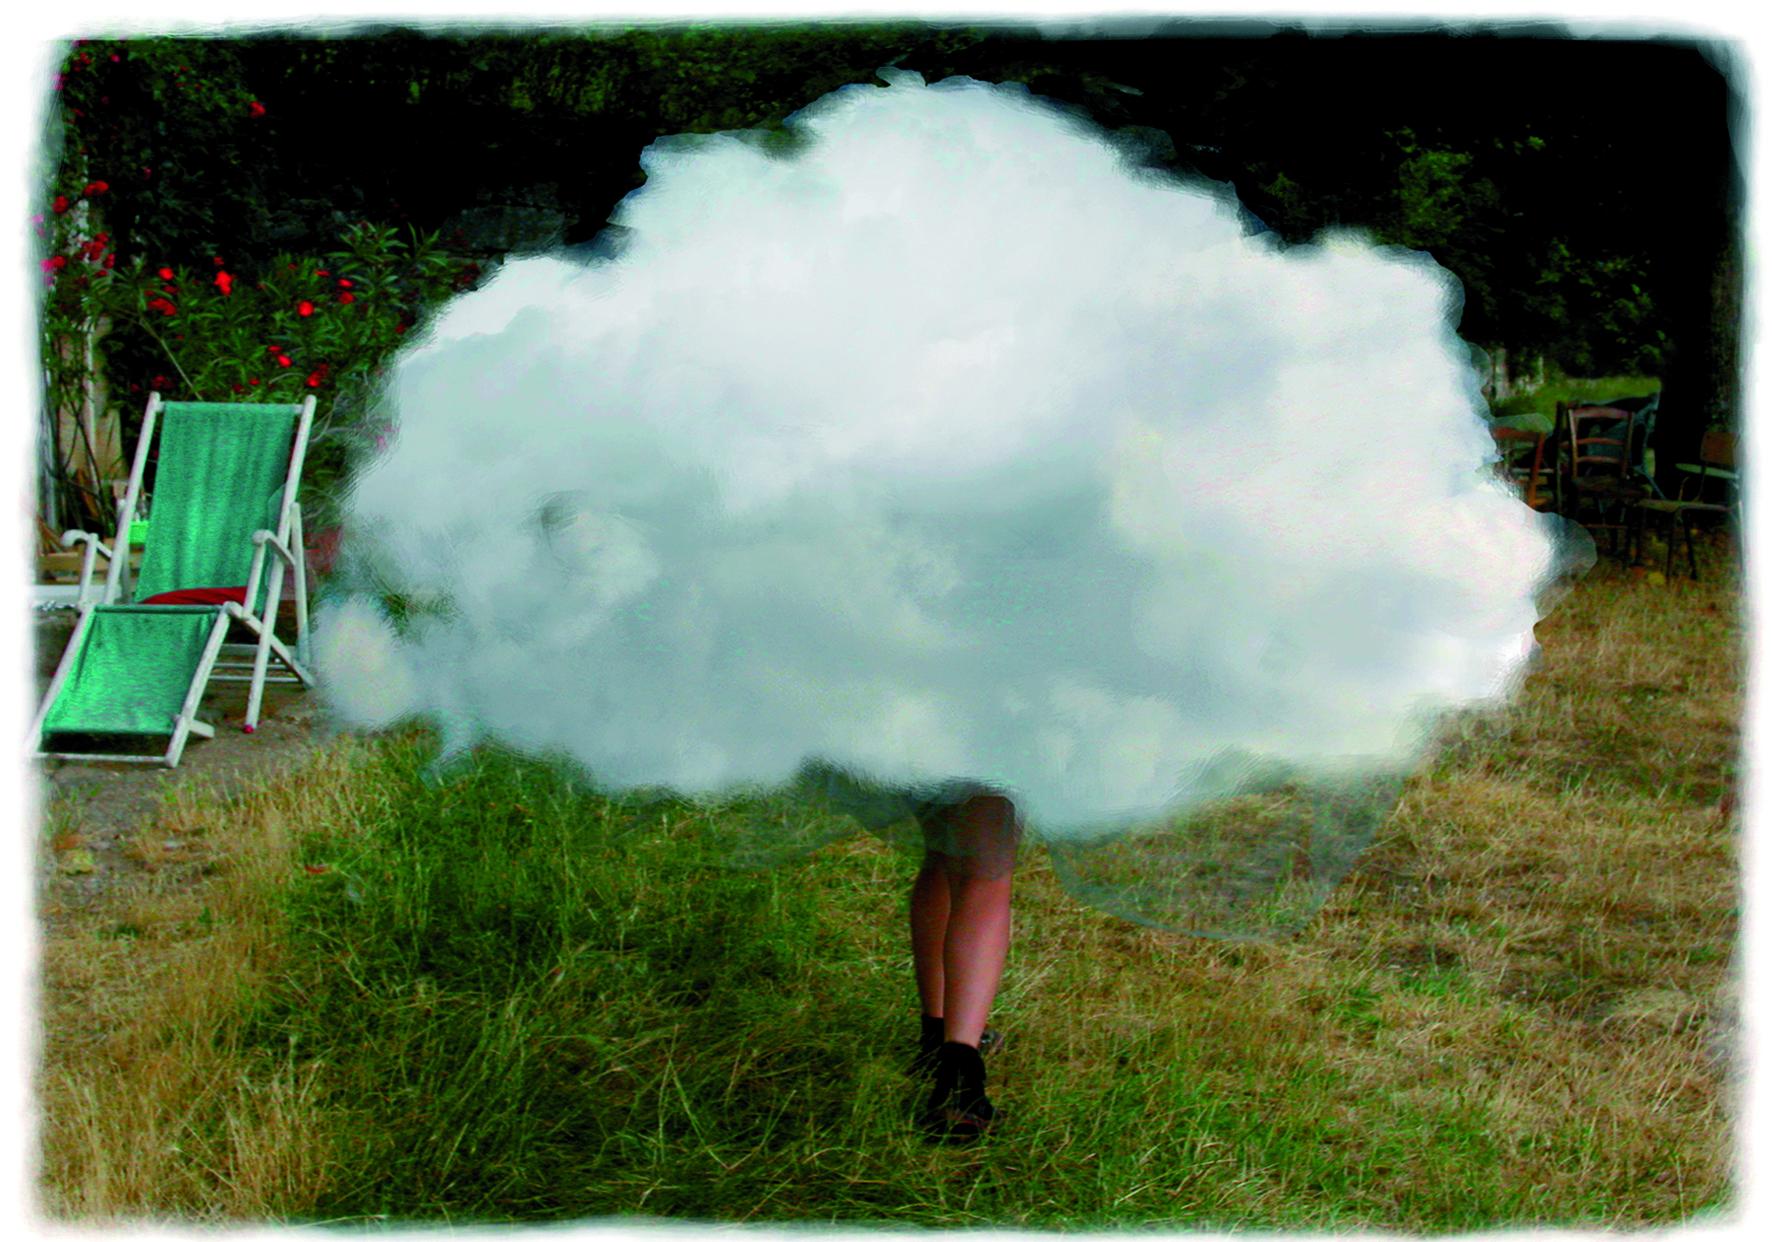 un_nuage_sur_la_terreadele_ogier